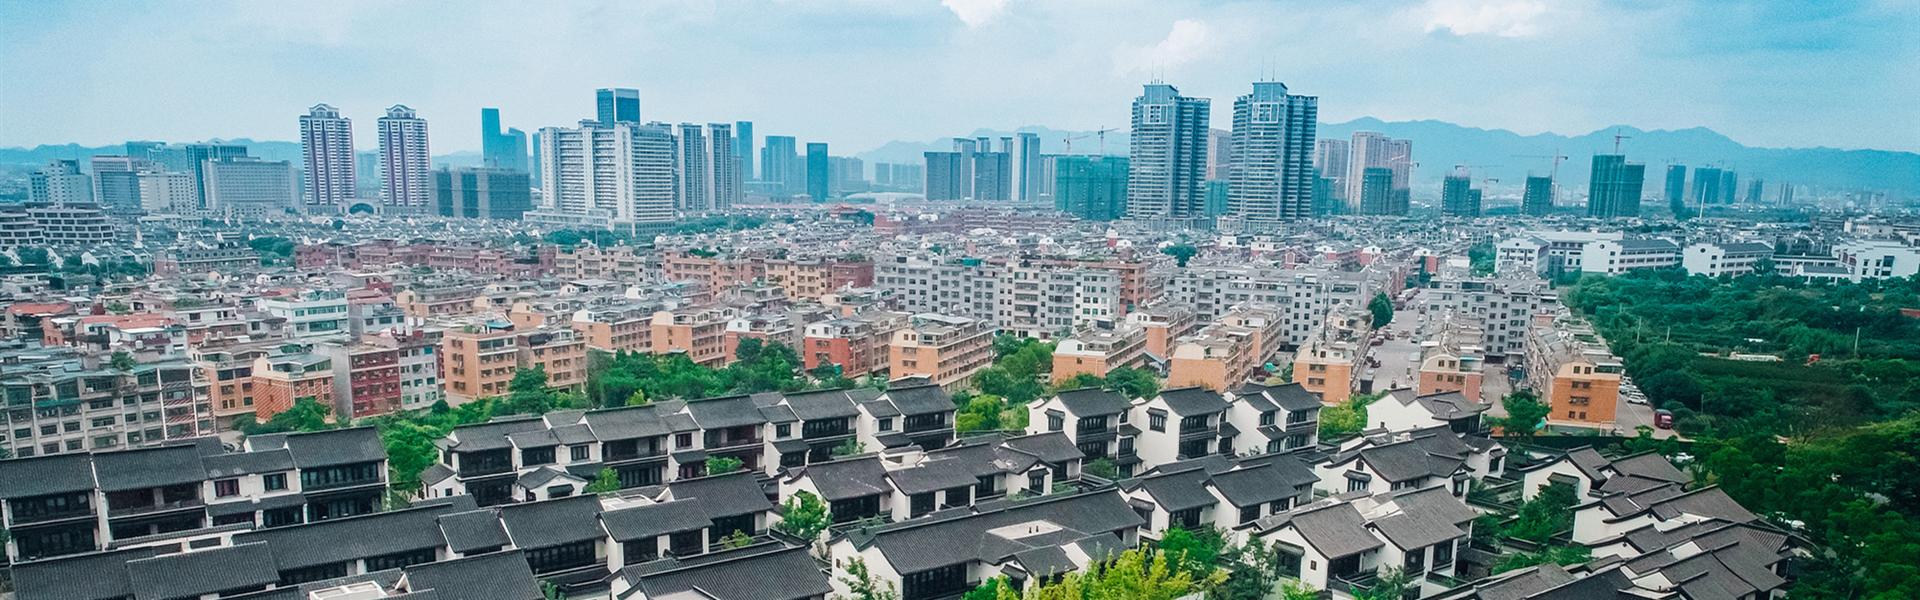 Yiwu city.jpg